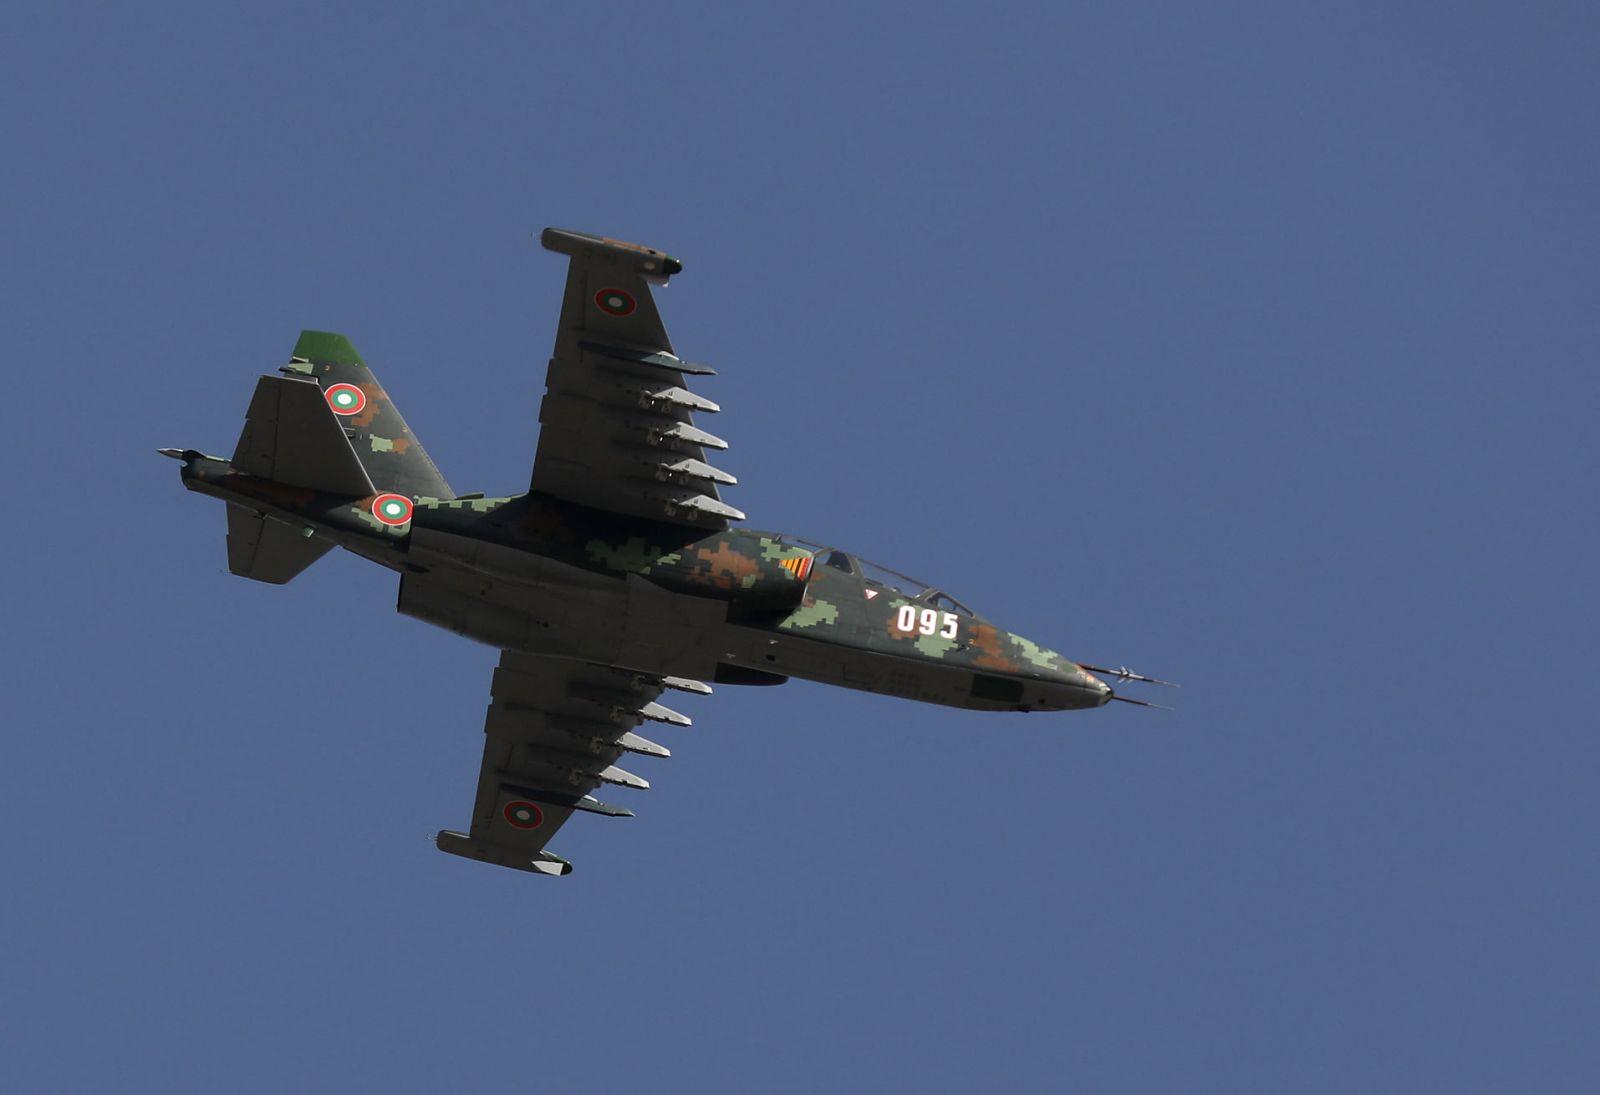 ГАЛЕРИЯ БРИЗ 2021: Су-25 от авиобаза Безмер с успешни полети над море